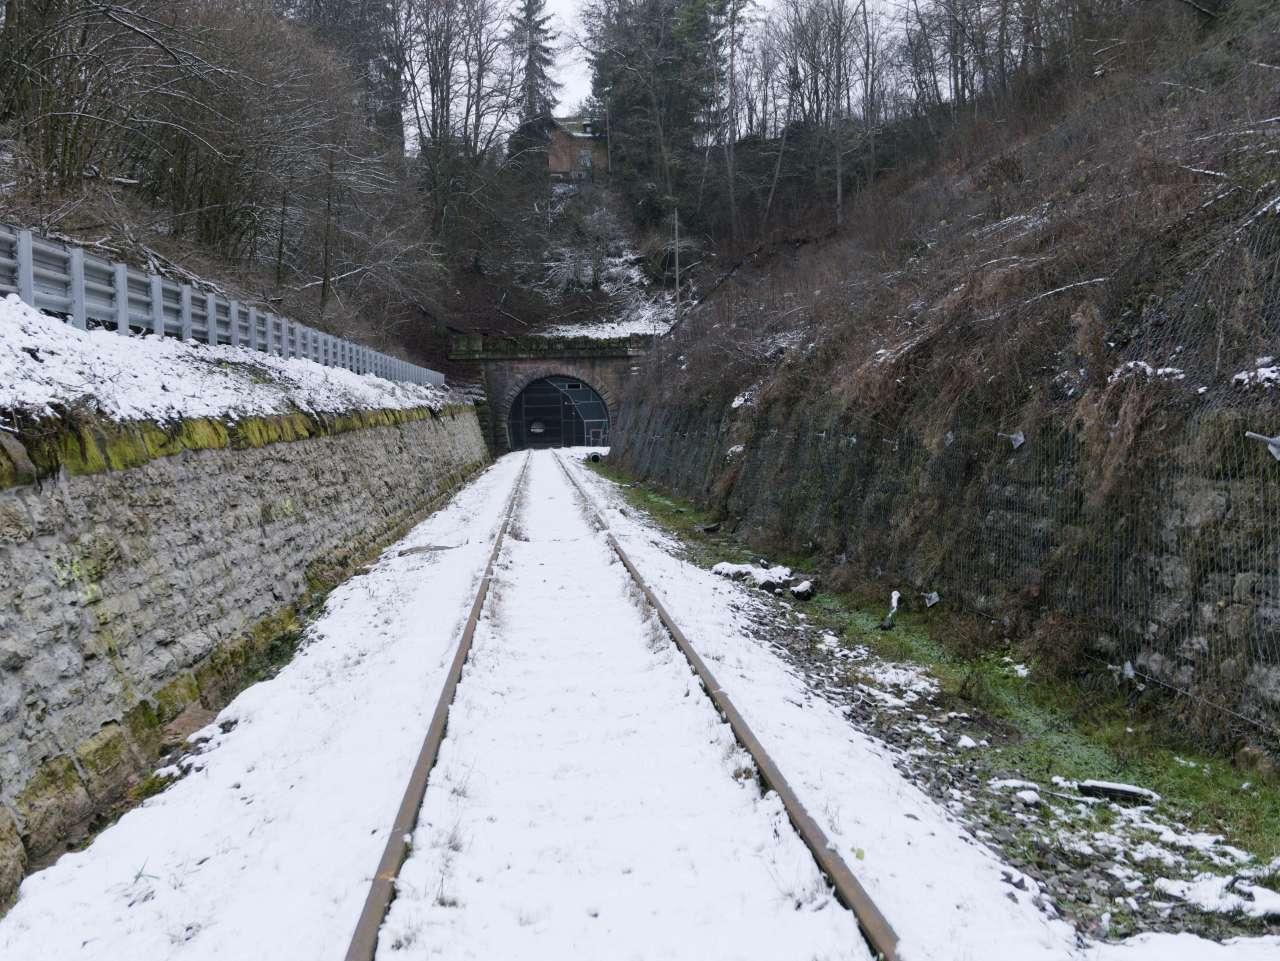 https://abload.de/img/3-12-tunneleinschnittq0k50.jpg